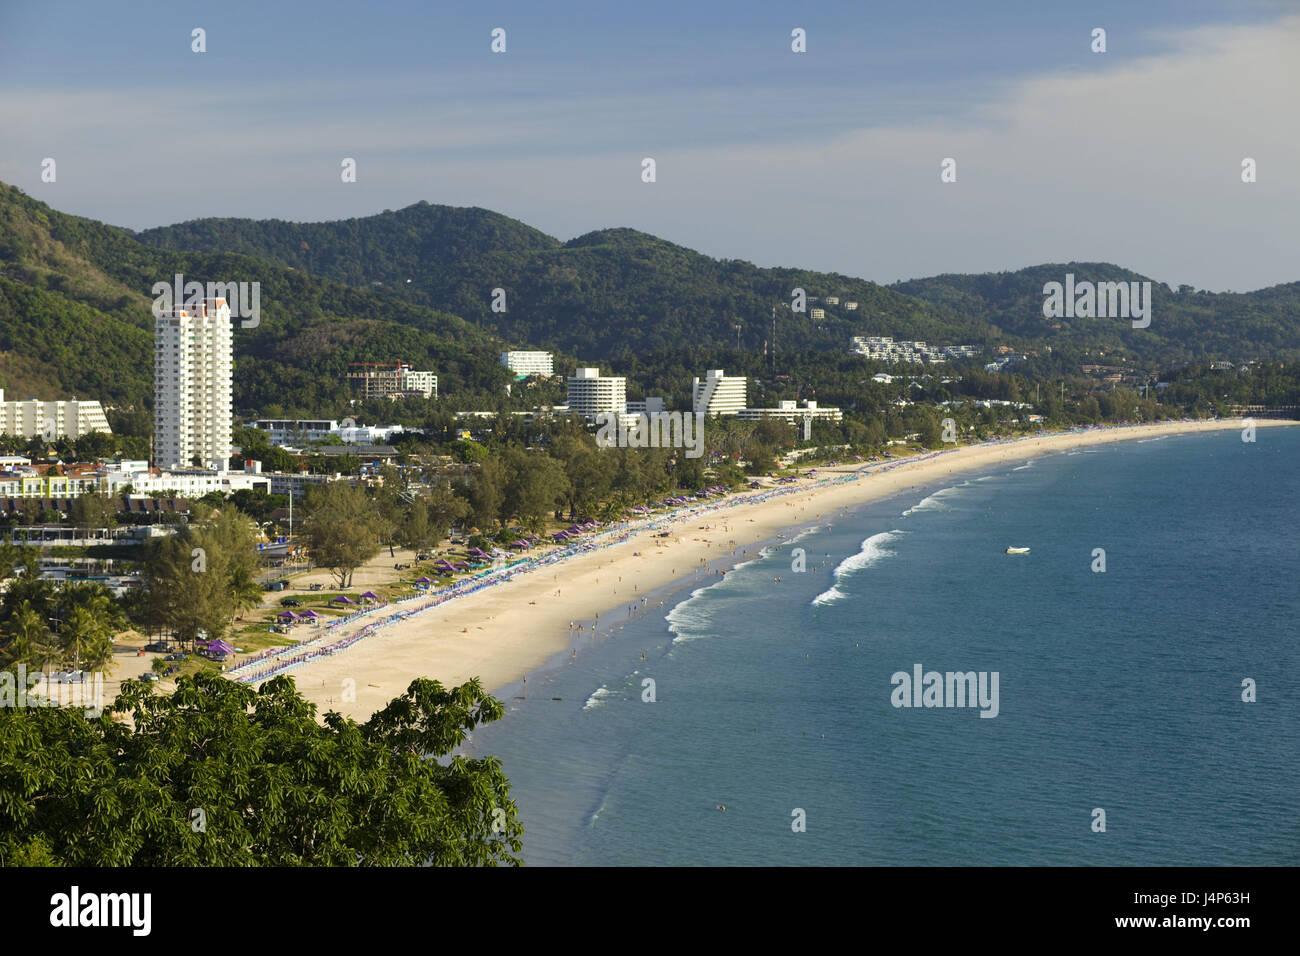 Thailand, Phuket, Karon Beach, overview, - Stock Image